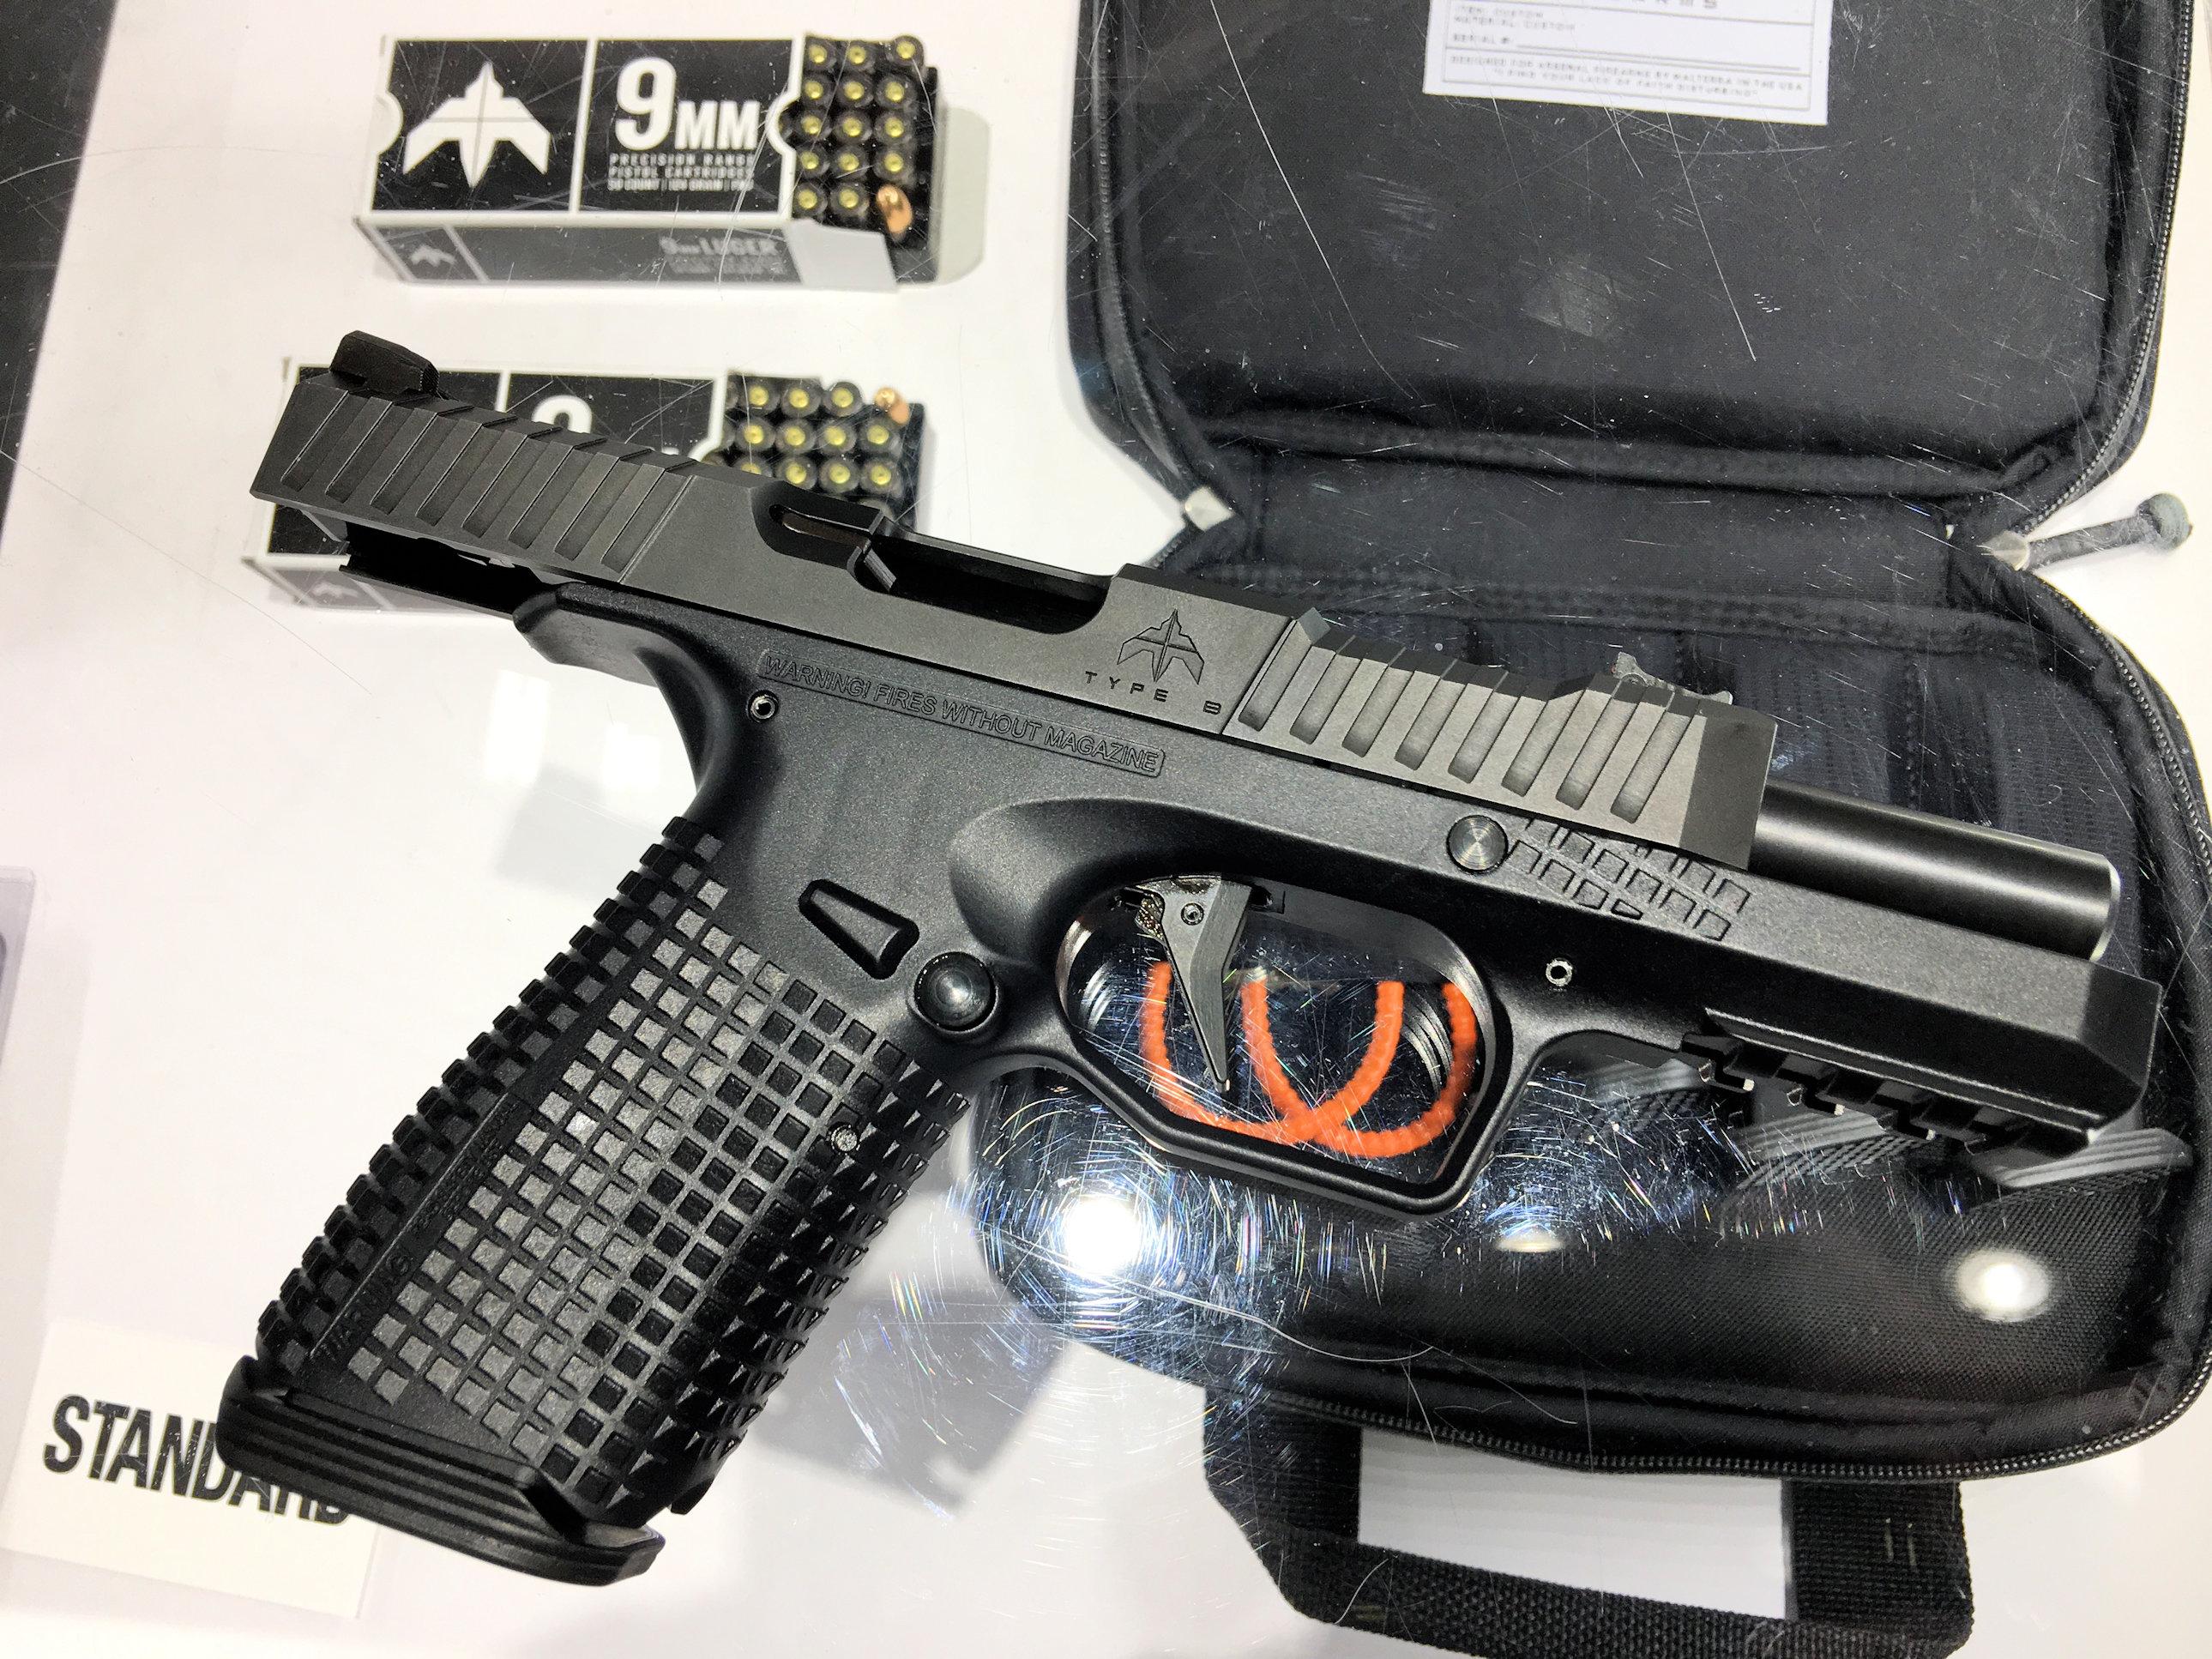 Archon Firearms Type B Striker-Fired Semi-Auto 9mm Combat